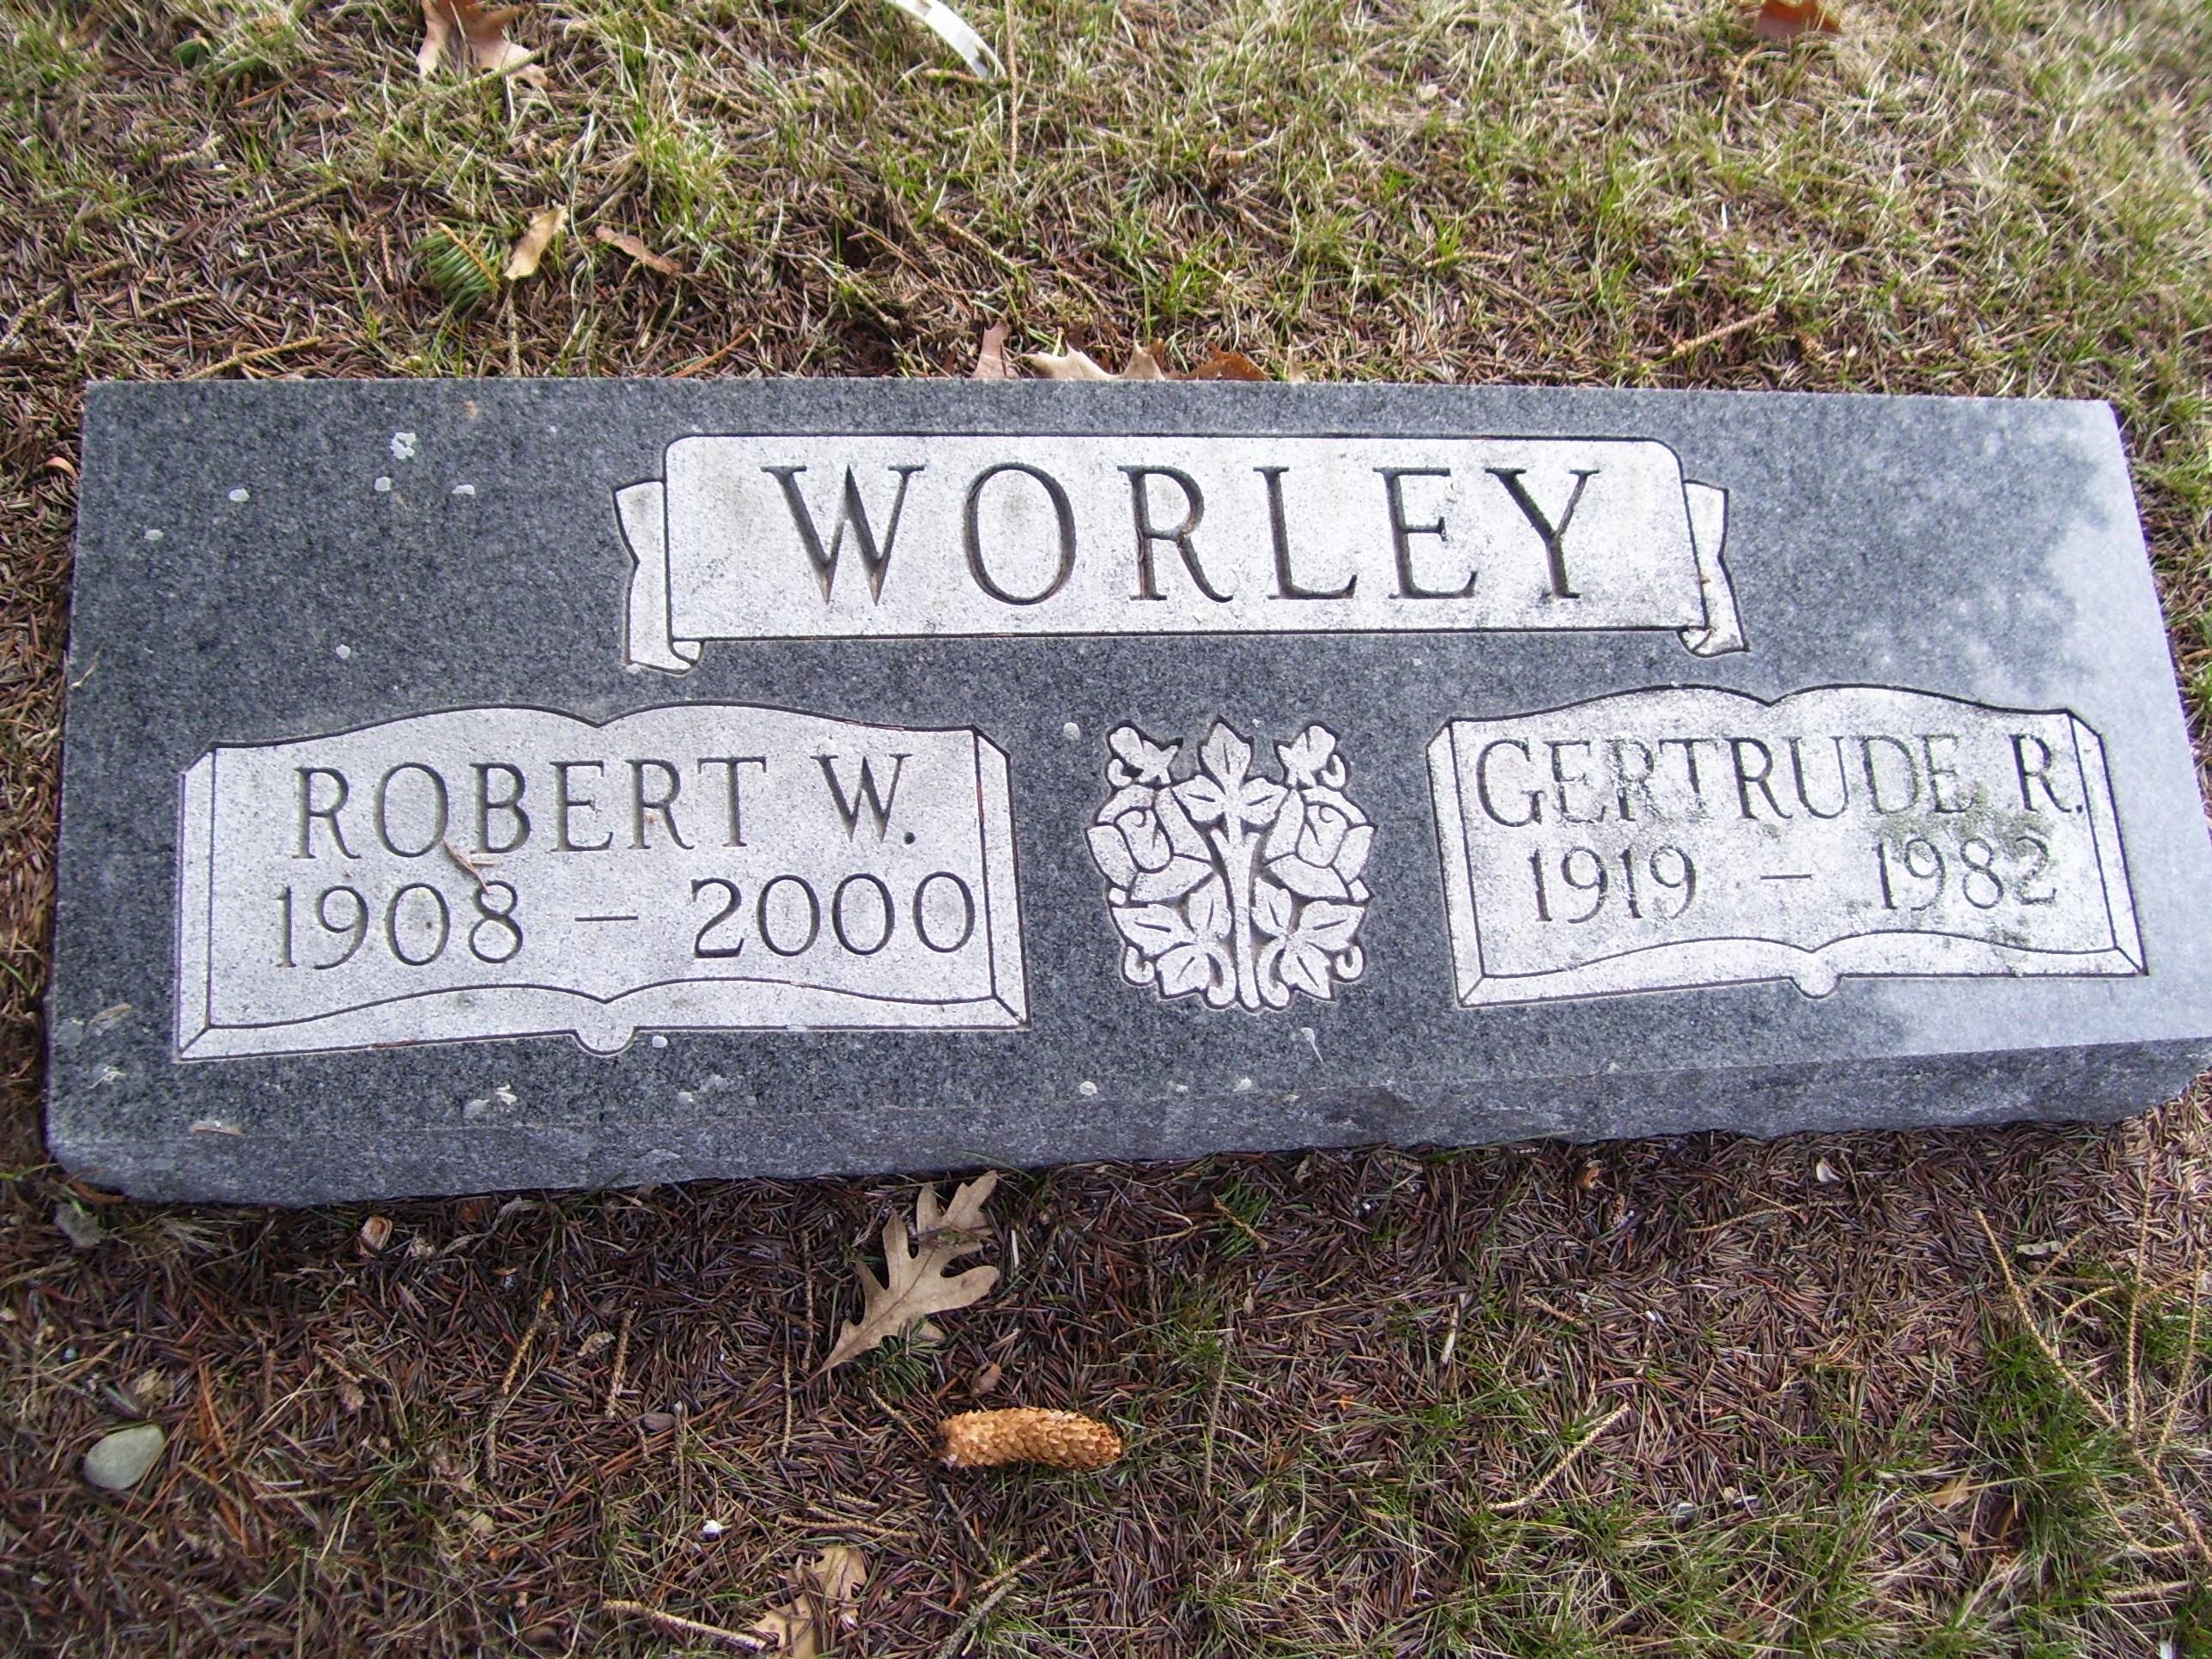 Robert Wayne Worley